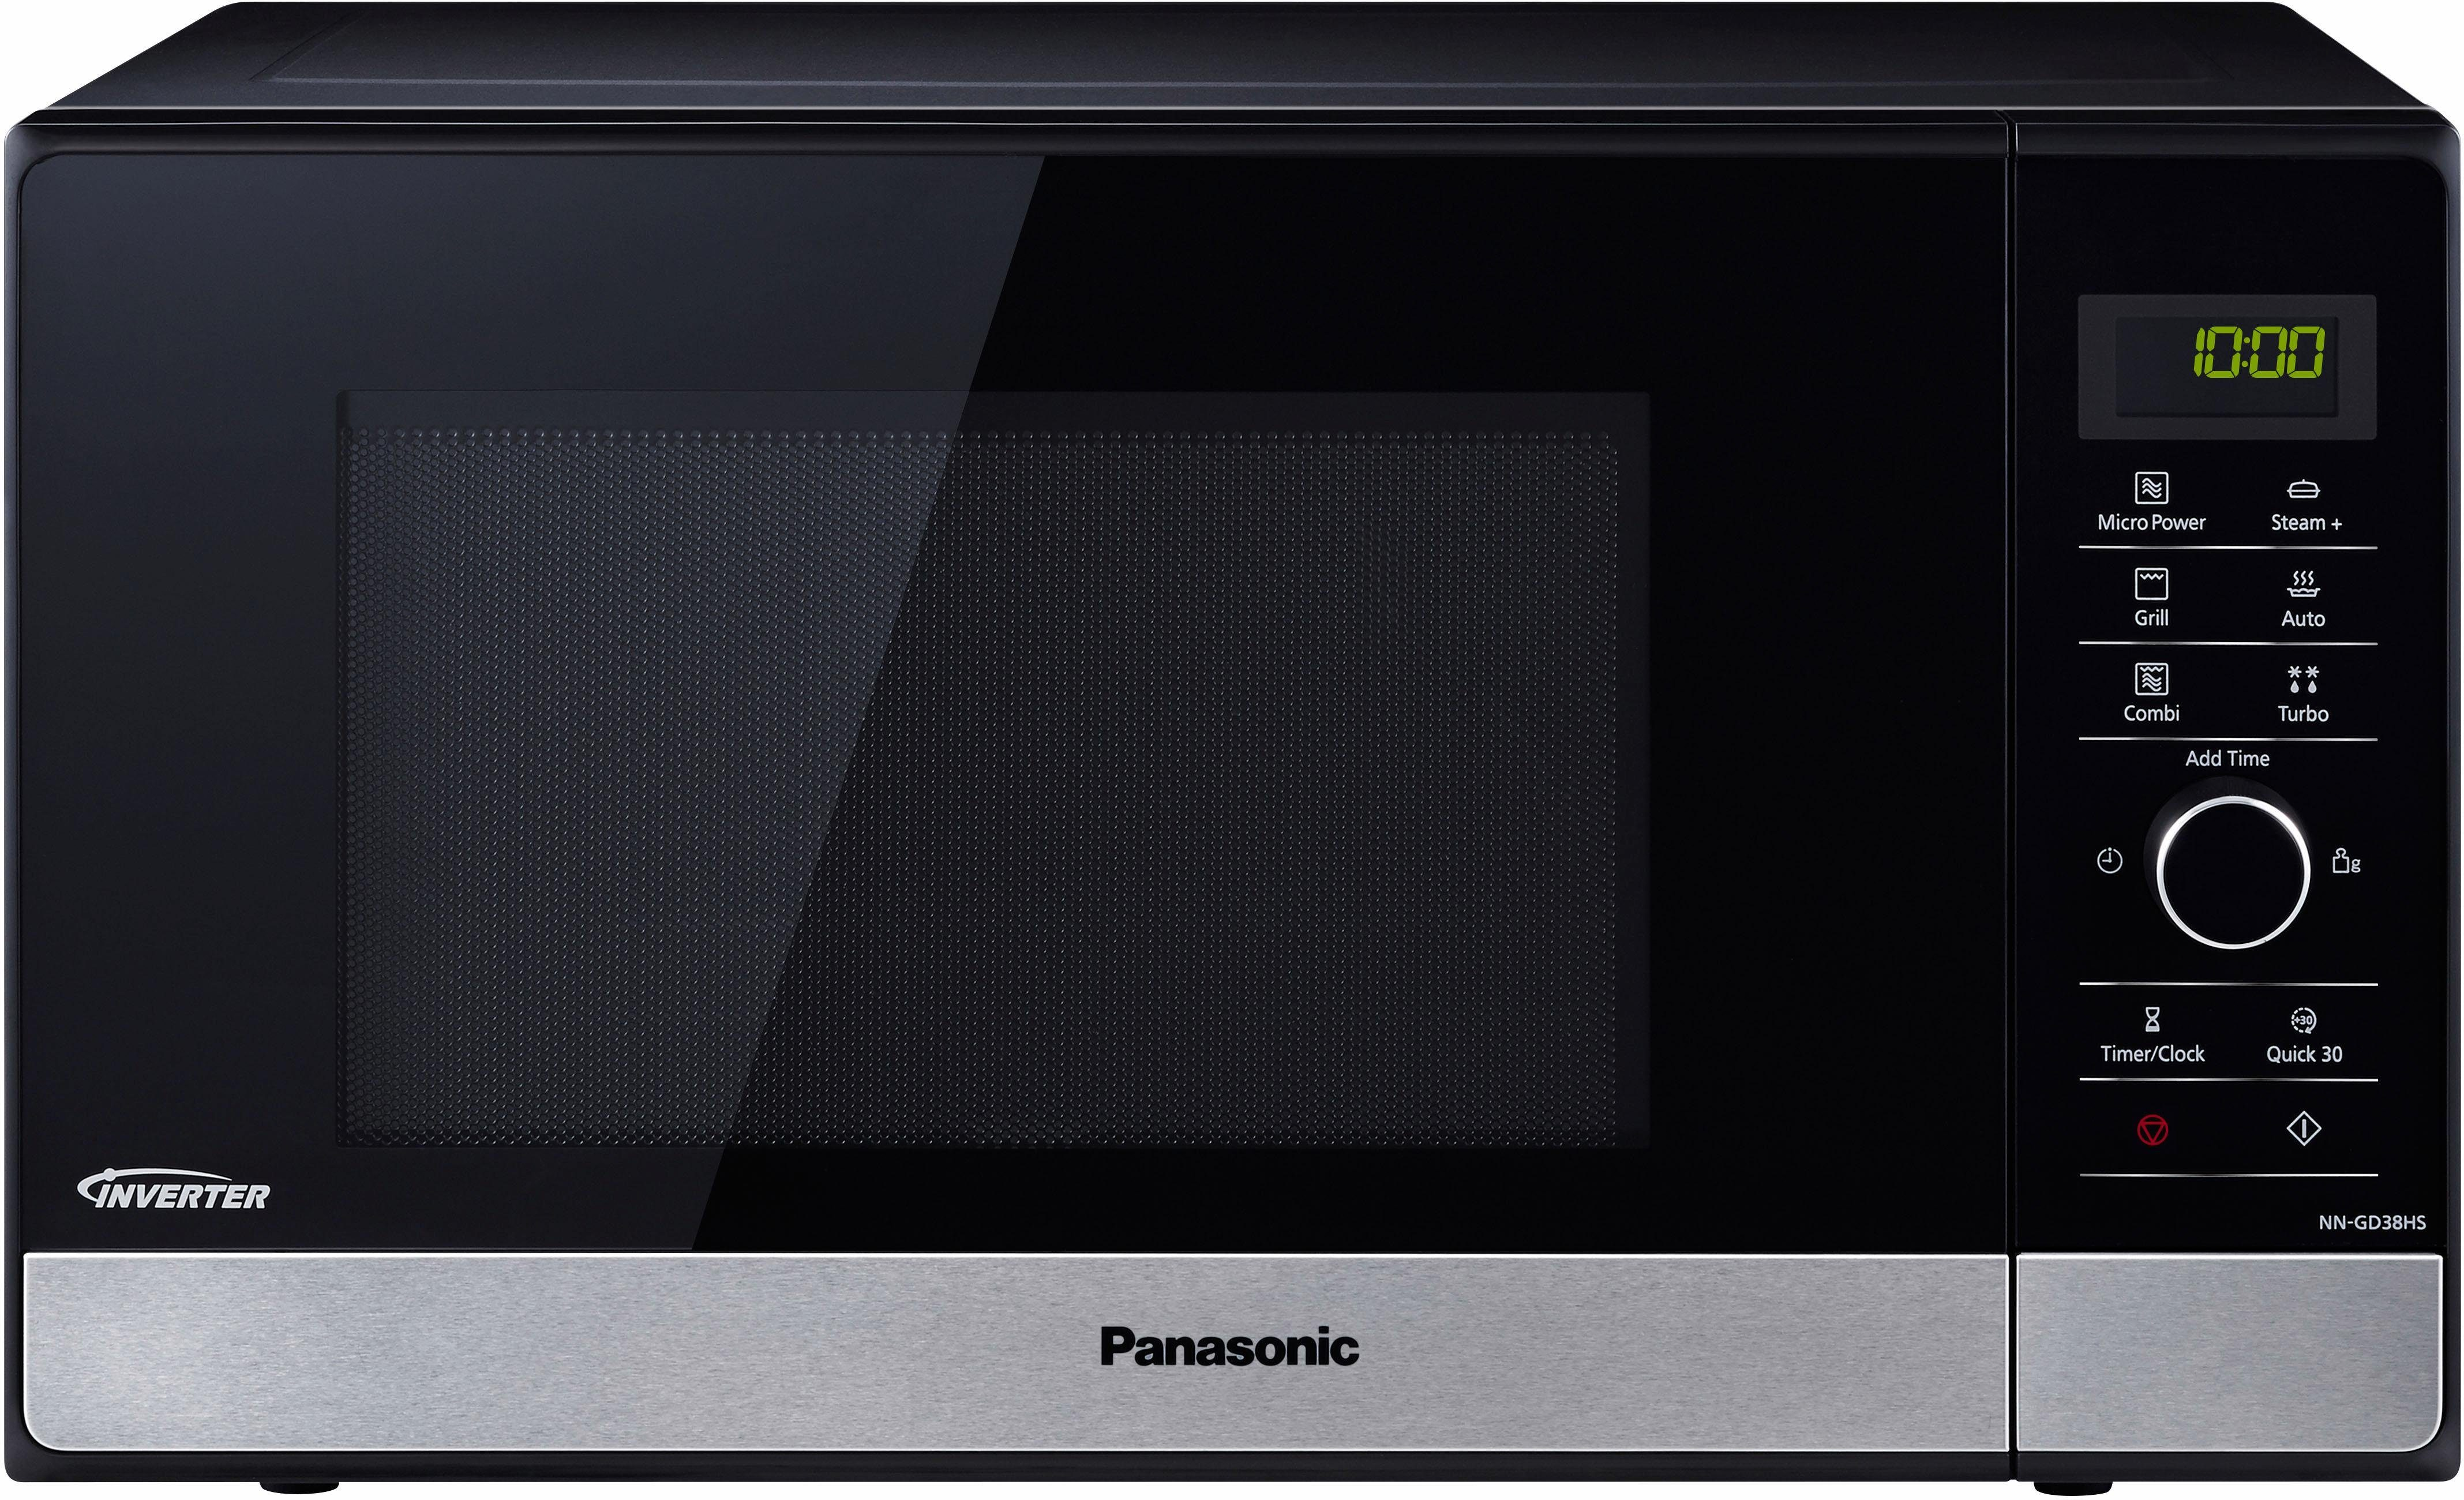 Panasonic Mikrowelle NN-GD38HSGTG, 1000 W, mit Grill